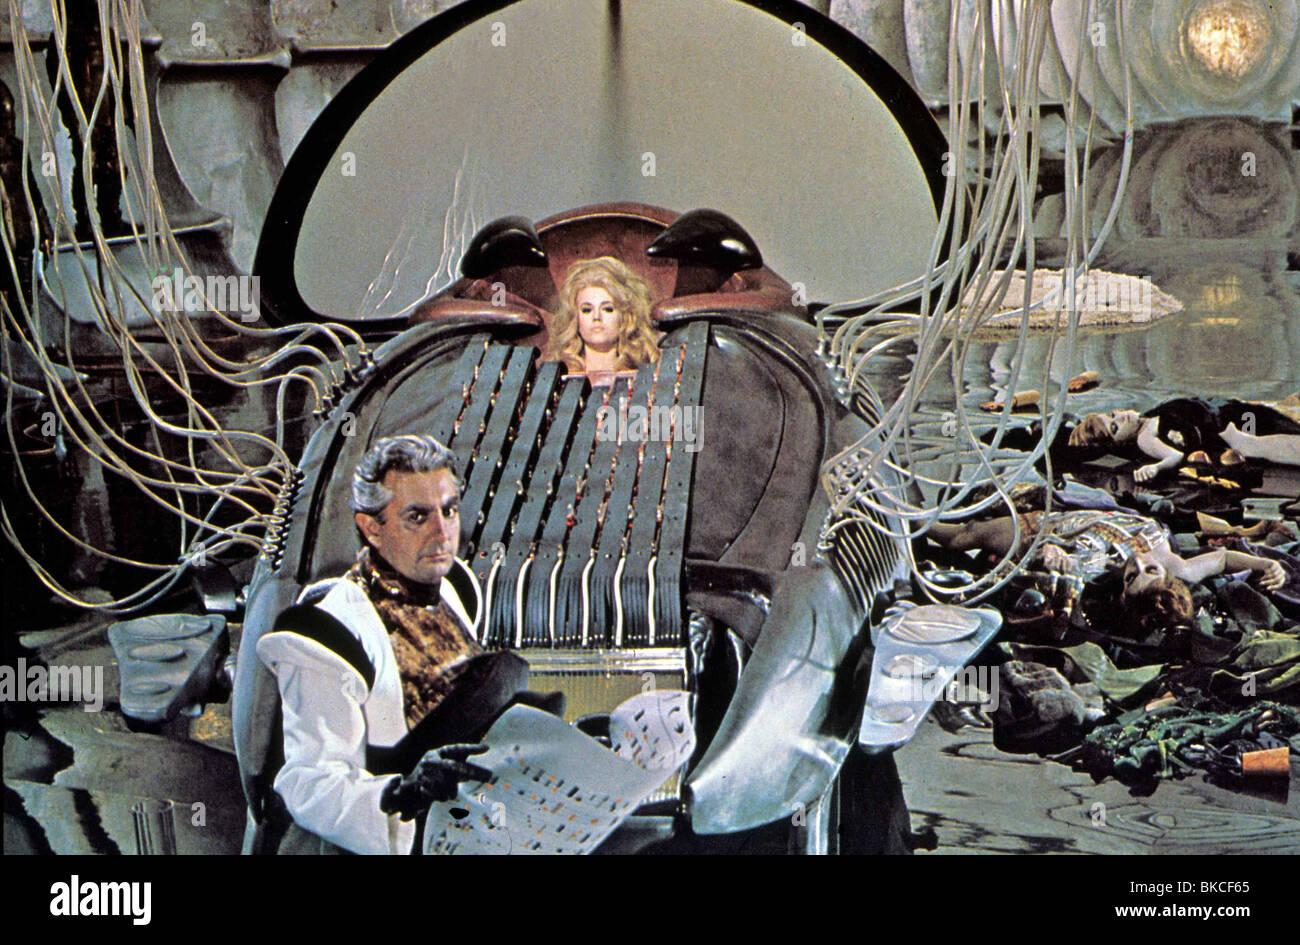 BARBARELLA (1967) MILO O'SHEA, DURAND DURAND, JANE FONDA, BARBARELLA BRB 032 Stock Photo